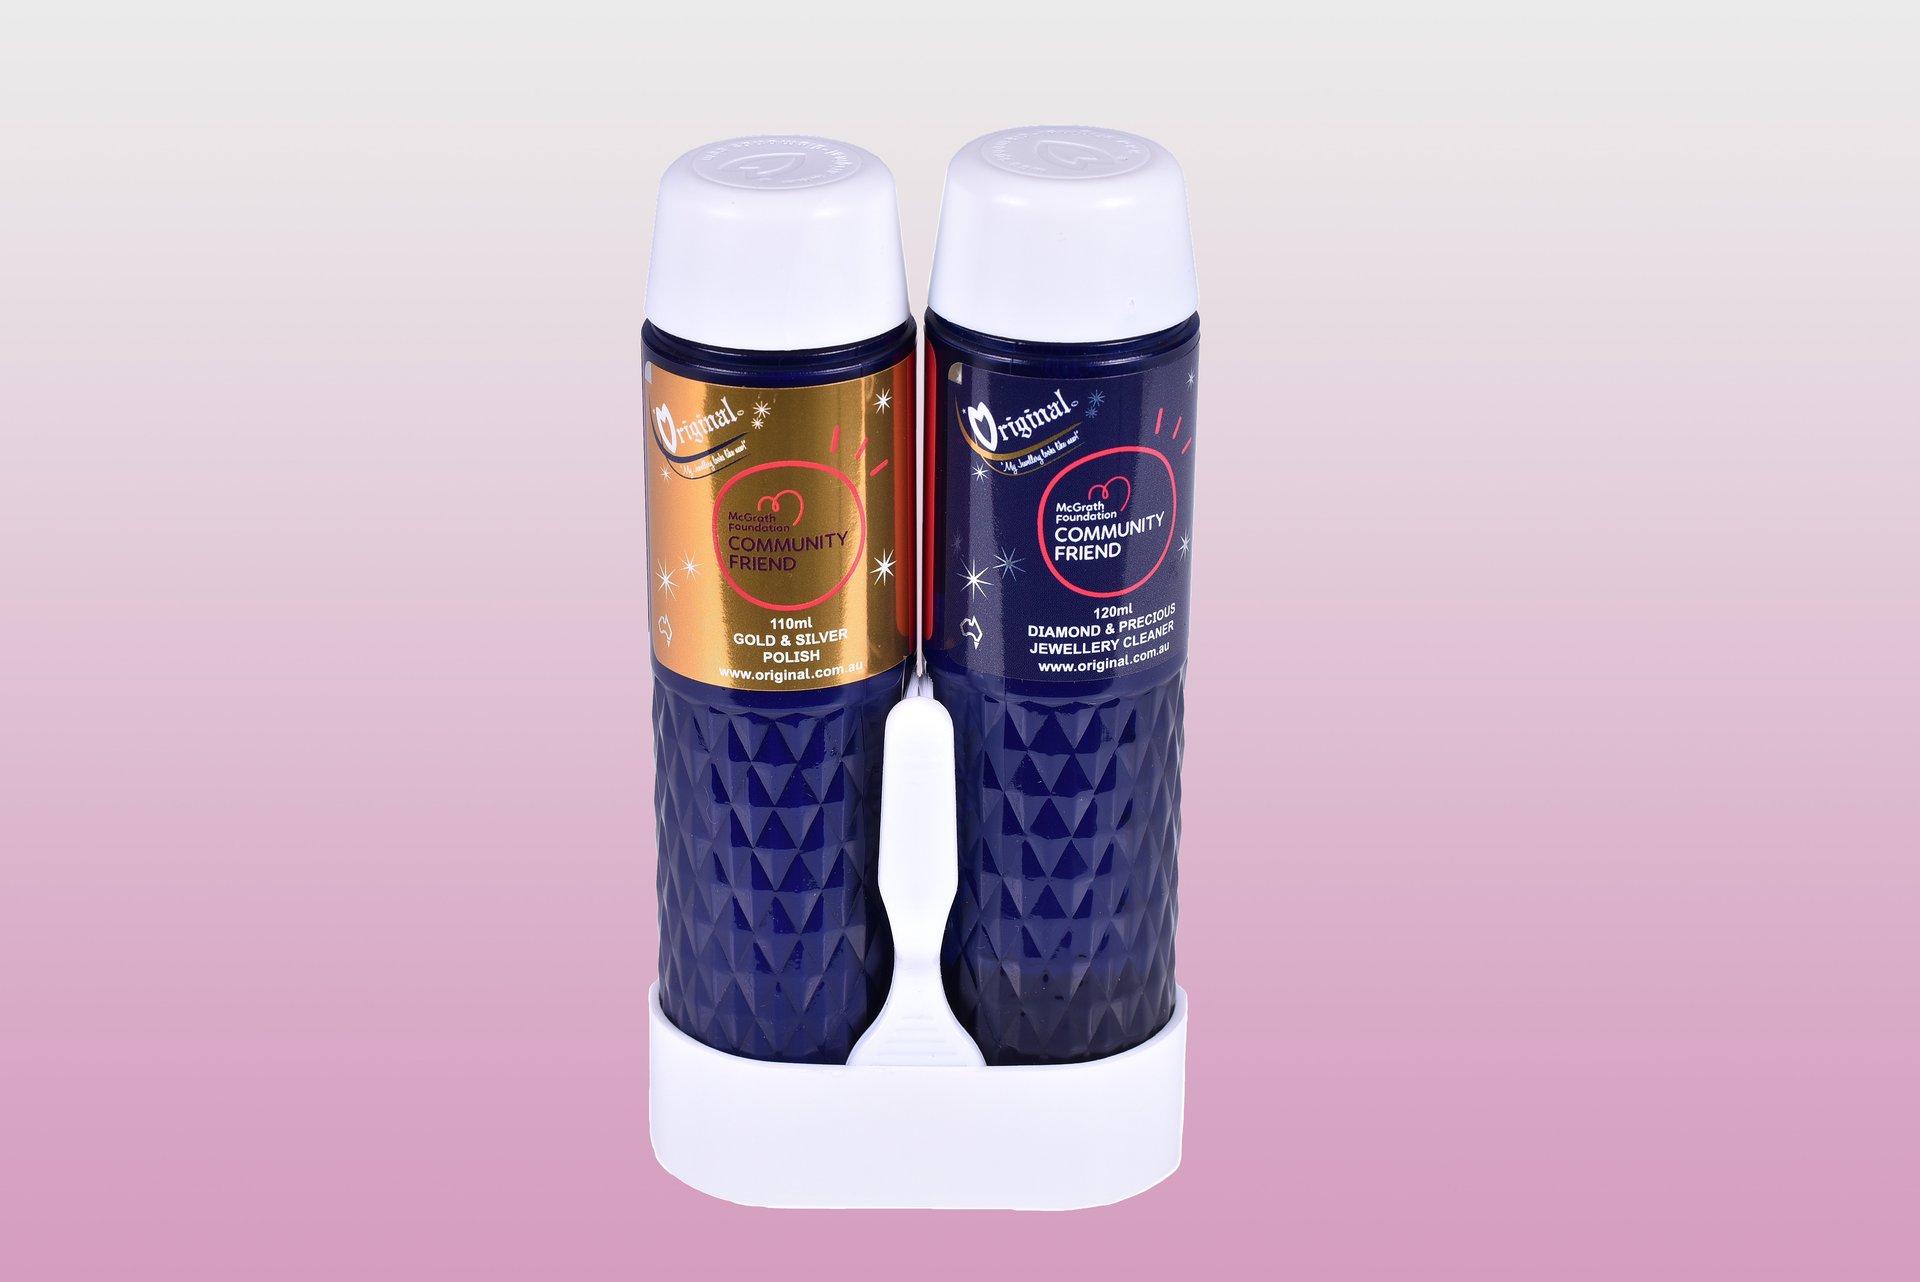 Community friend spray cans